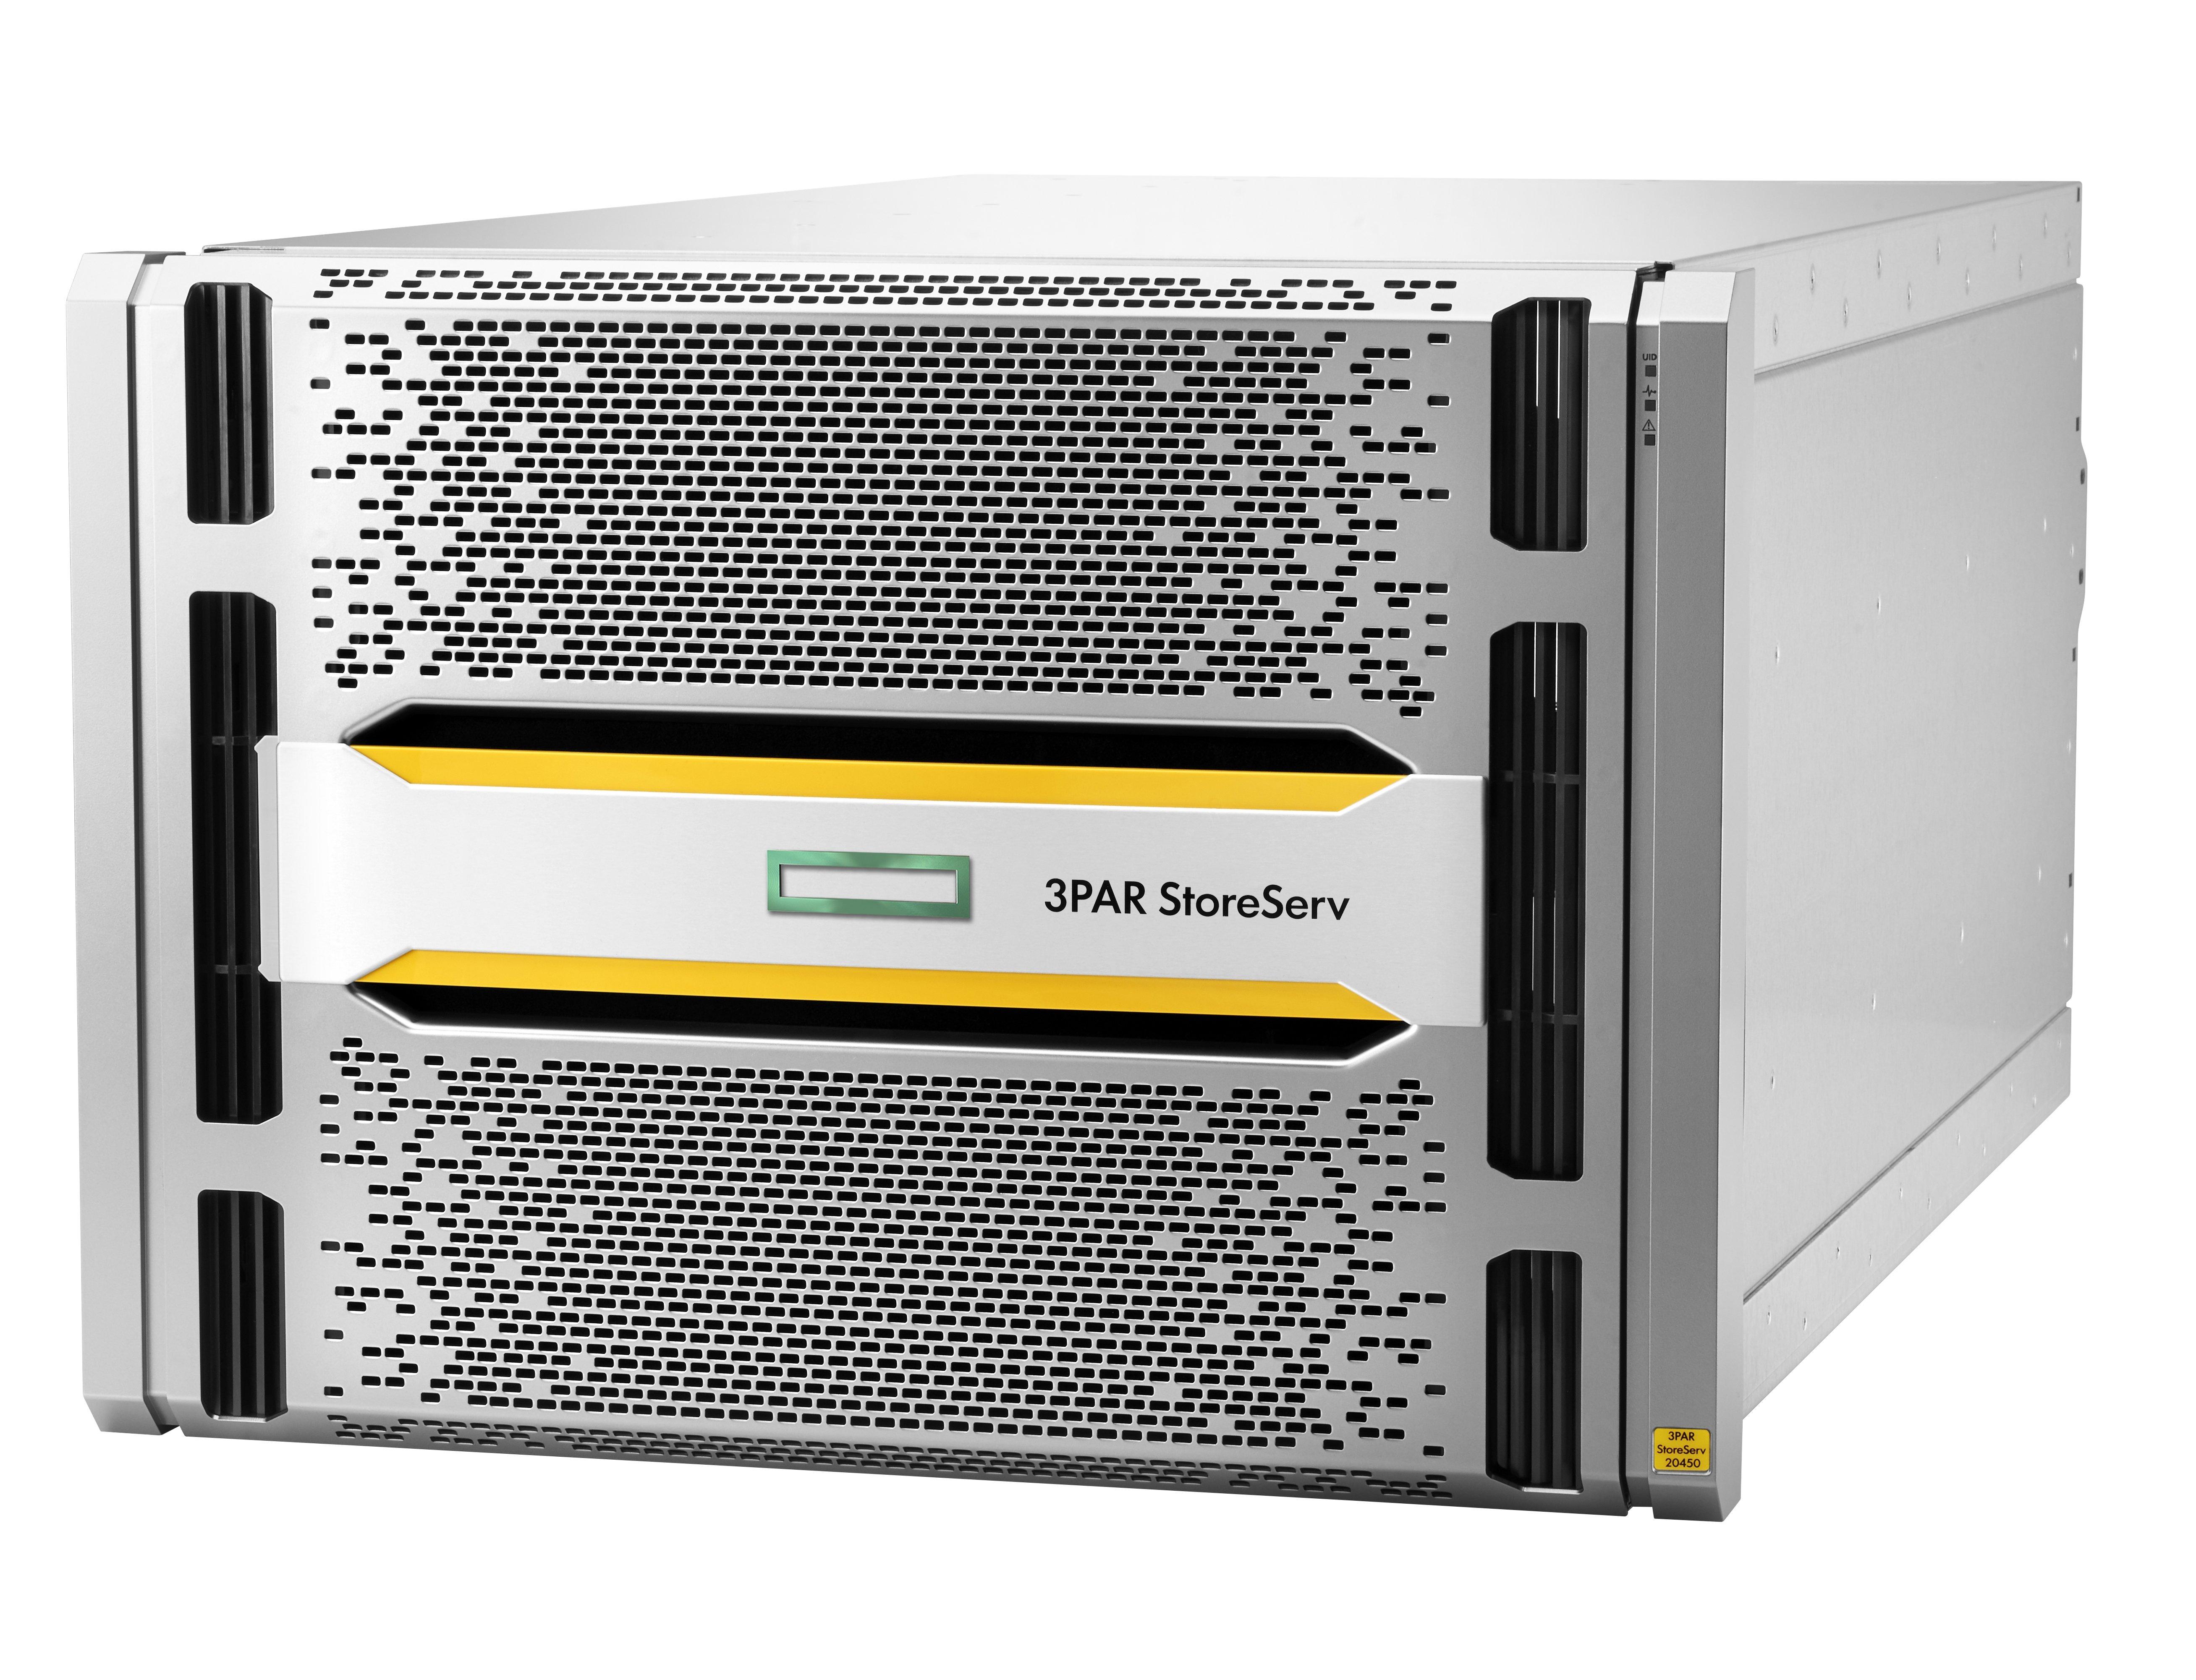 HPE 3PAR StoreServ 20000 4-way Storage Configuration Base | Product